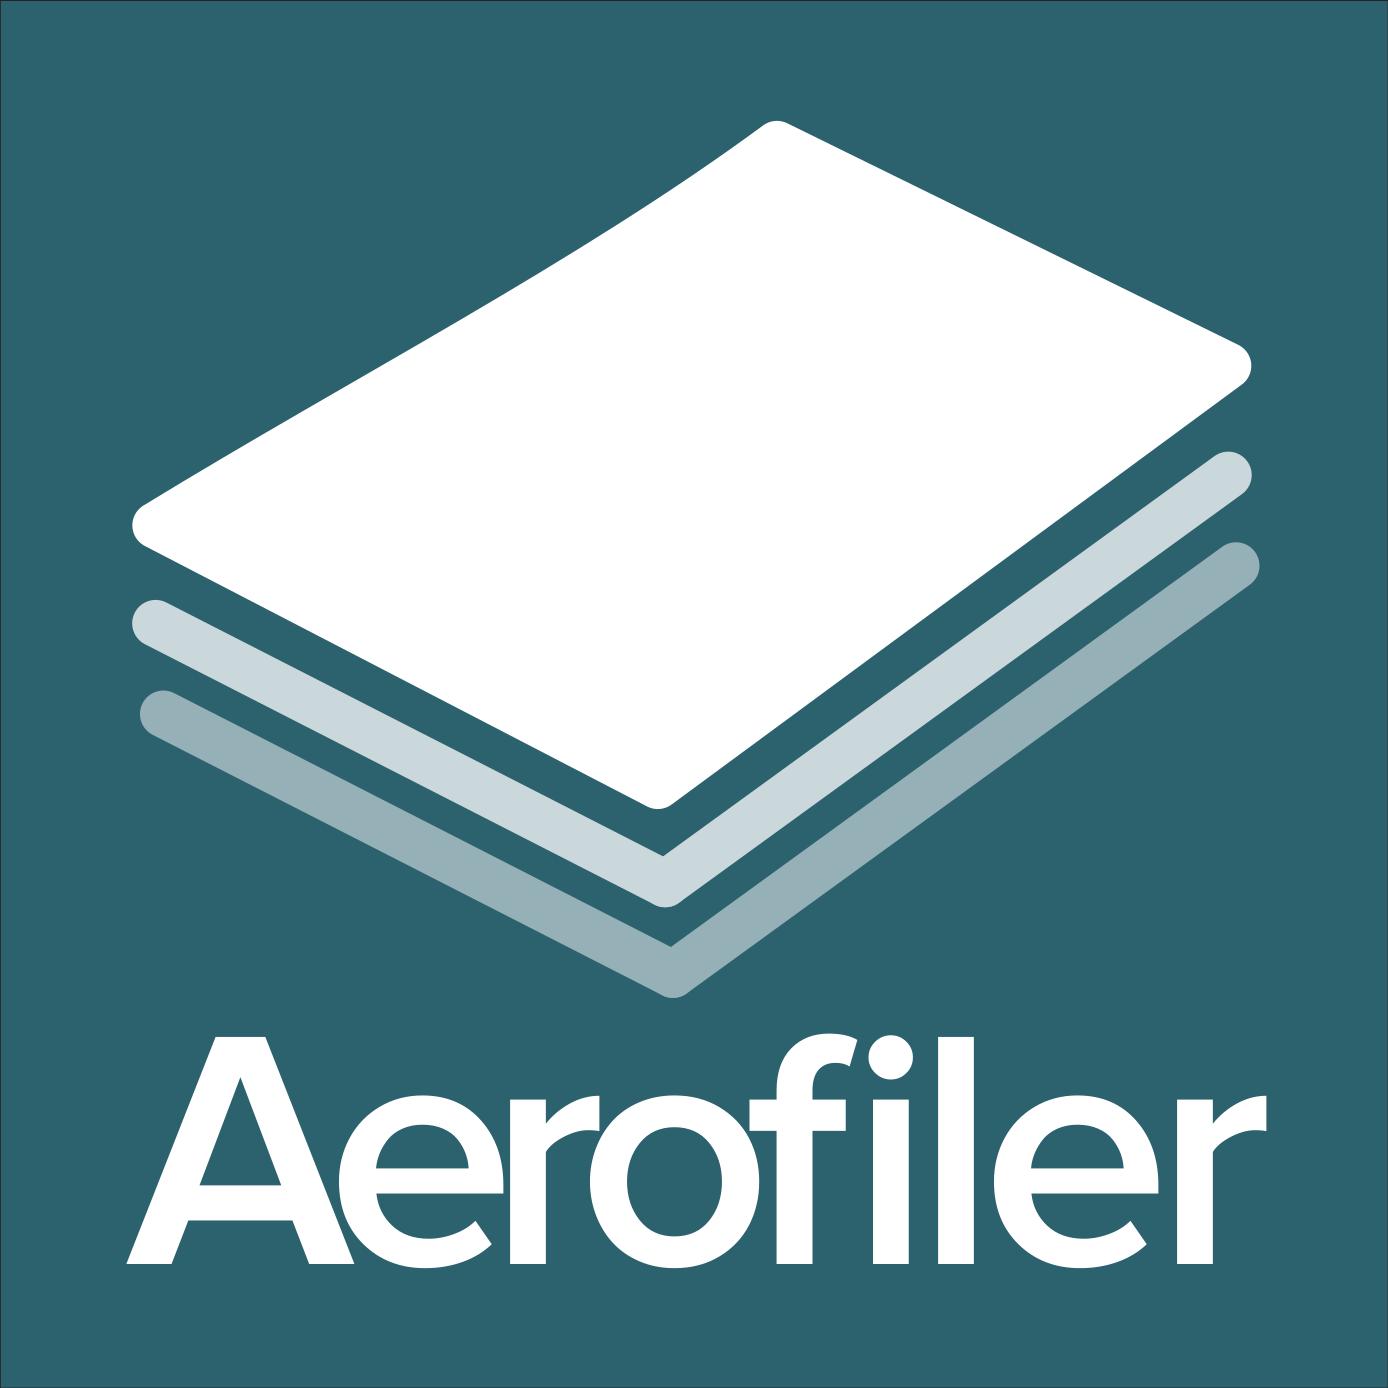 Aerofiler